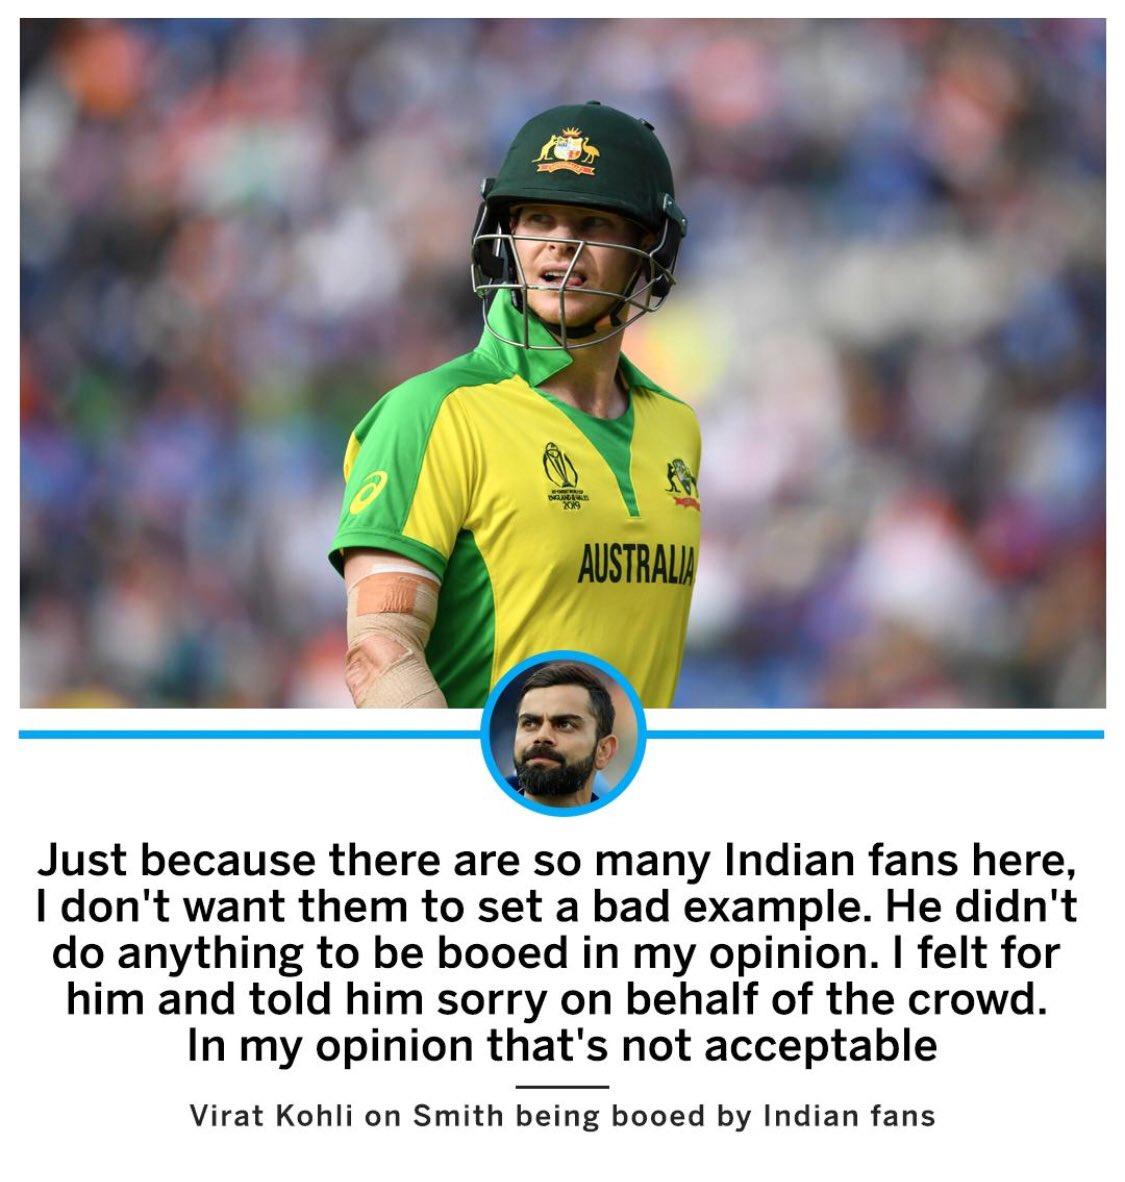 Incredible sportsmanship from Kohli #SpiritOfCricket He won many's heart around the world #ViratKohli@imVkohli and @stevesmith49 they both are great players.#SteveSmith